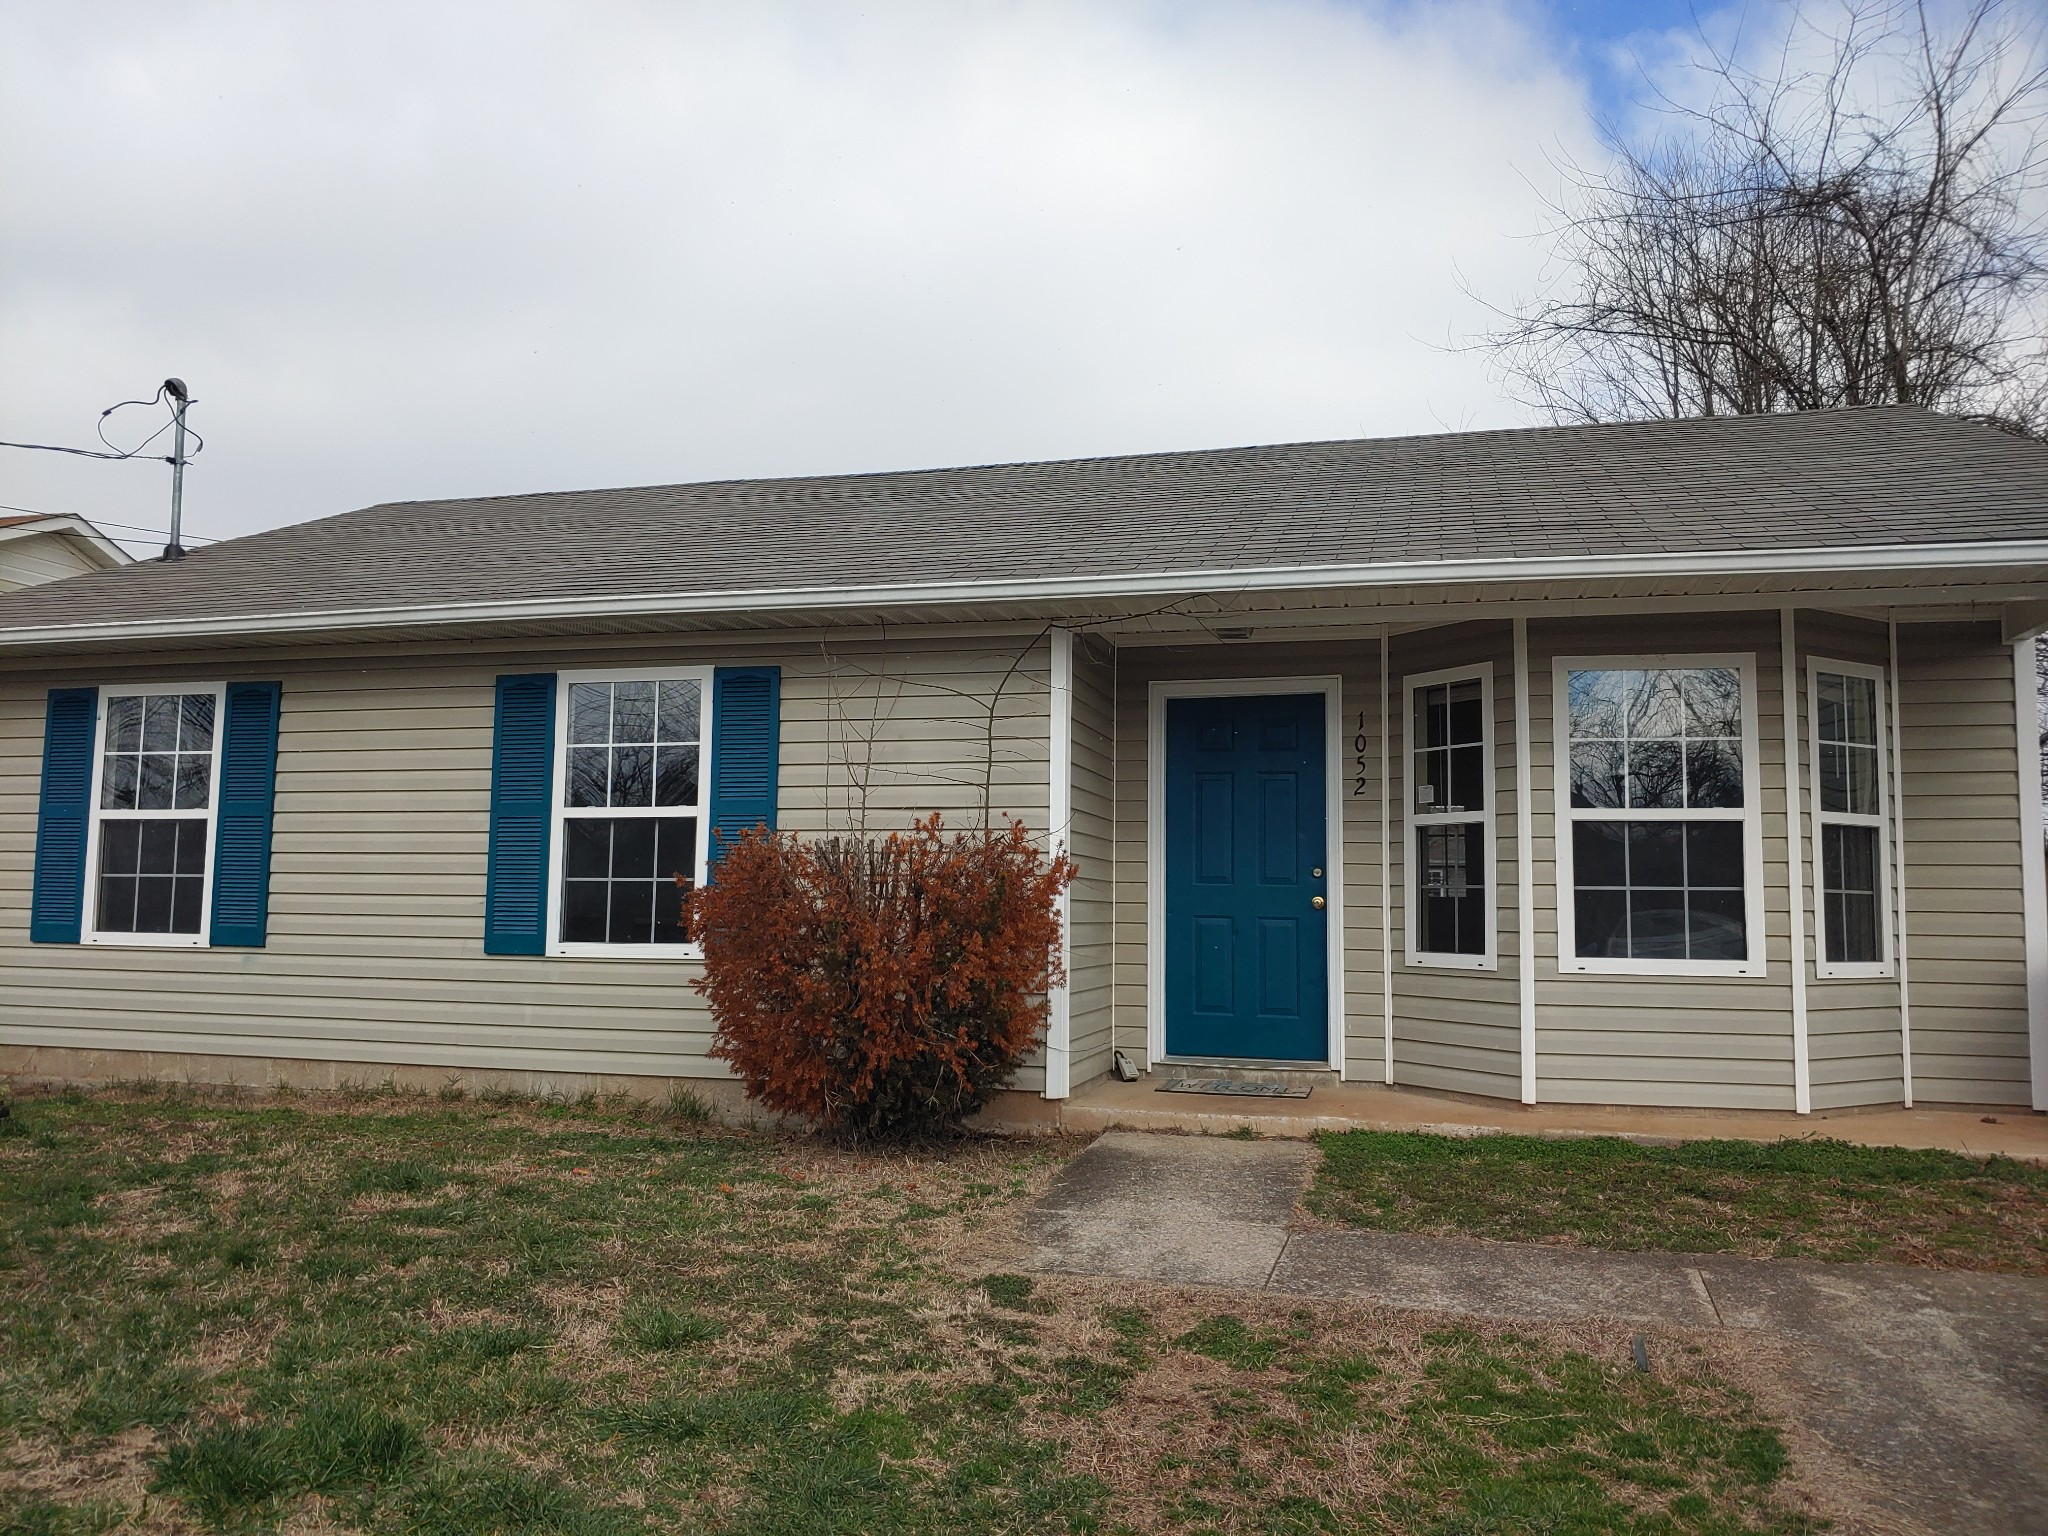 1052 Shadow Ridge Ave, Oak Grove, KY 42262 - Oak Grove, KY real estate listing